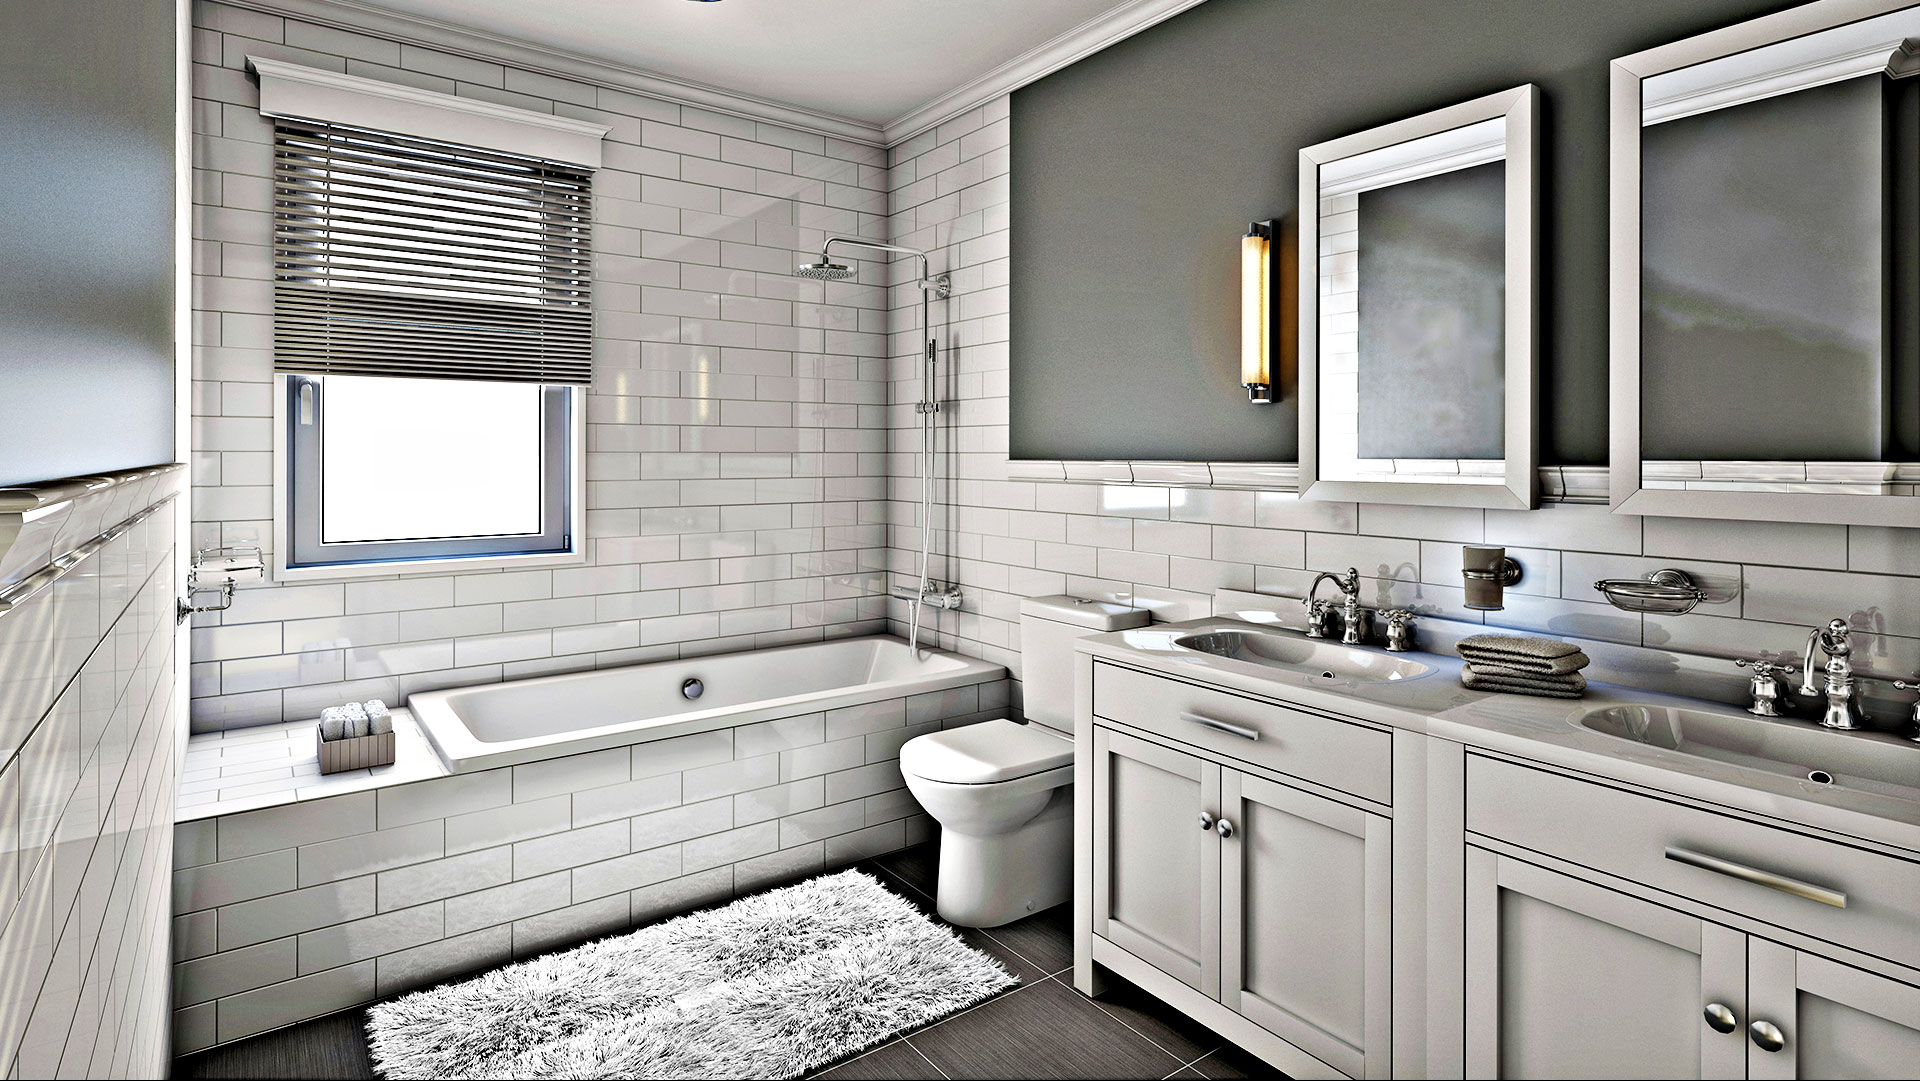 Epic Home Improvements Inc. Remodeled Bathroom